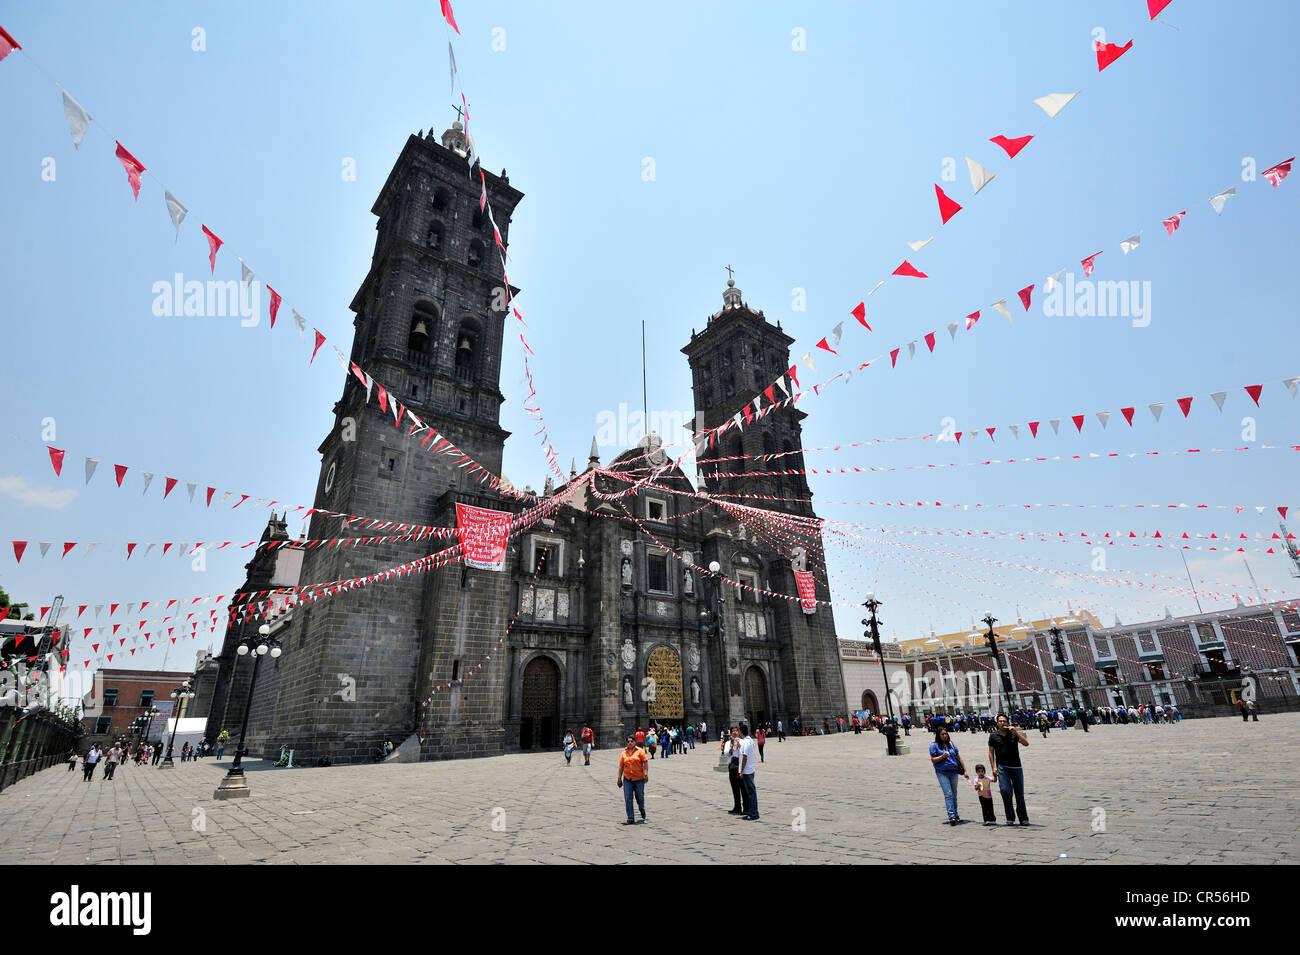 Puebla Cathedral, Puebla, UNESCO World Heritage Site, Mexico, Latin America, North America - Stock Image